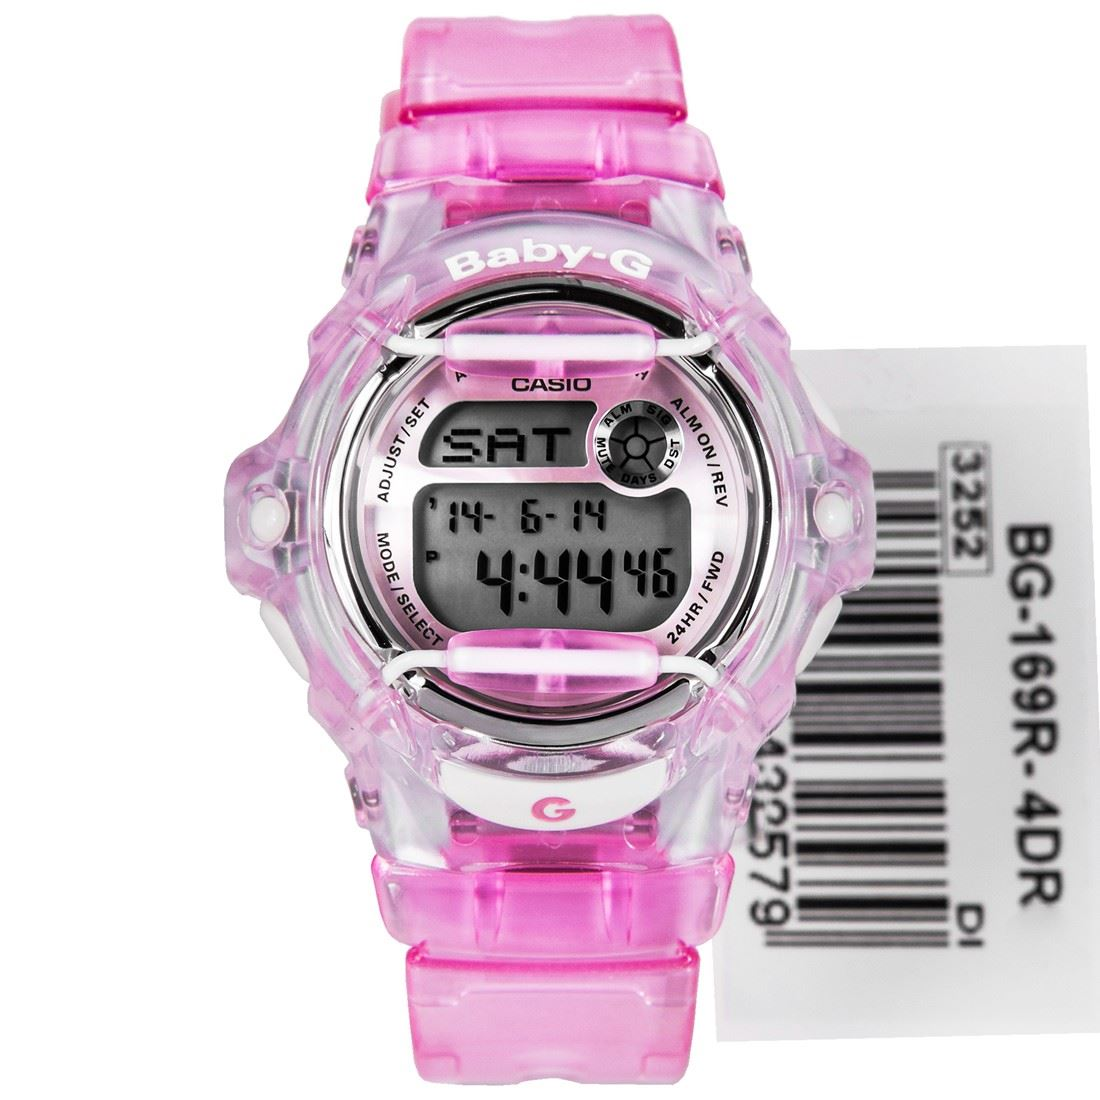 casio pink baby g womens bg 169r 4 bg169r ebay